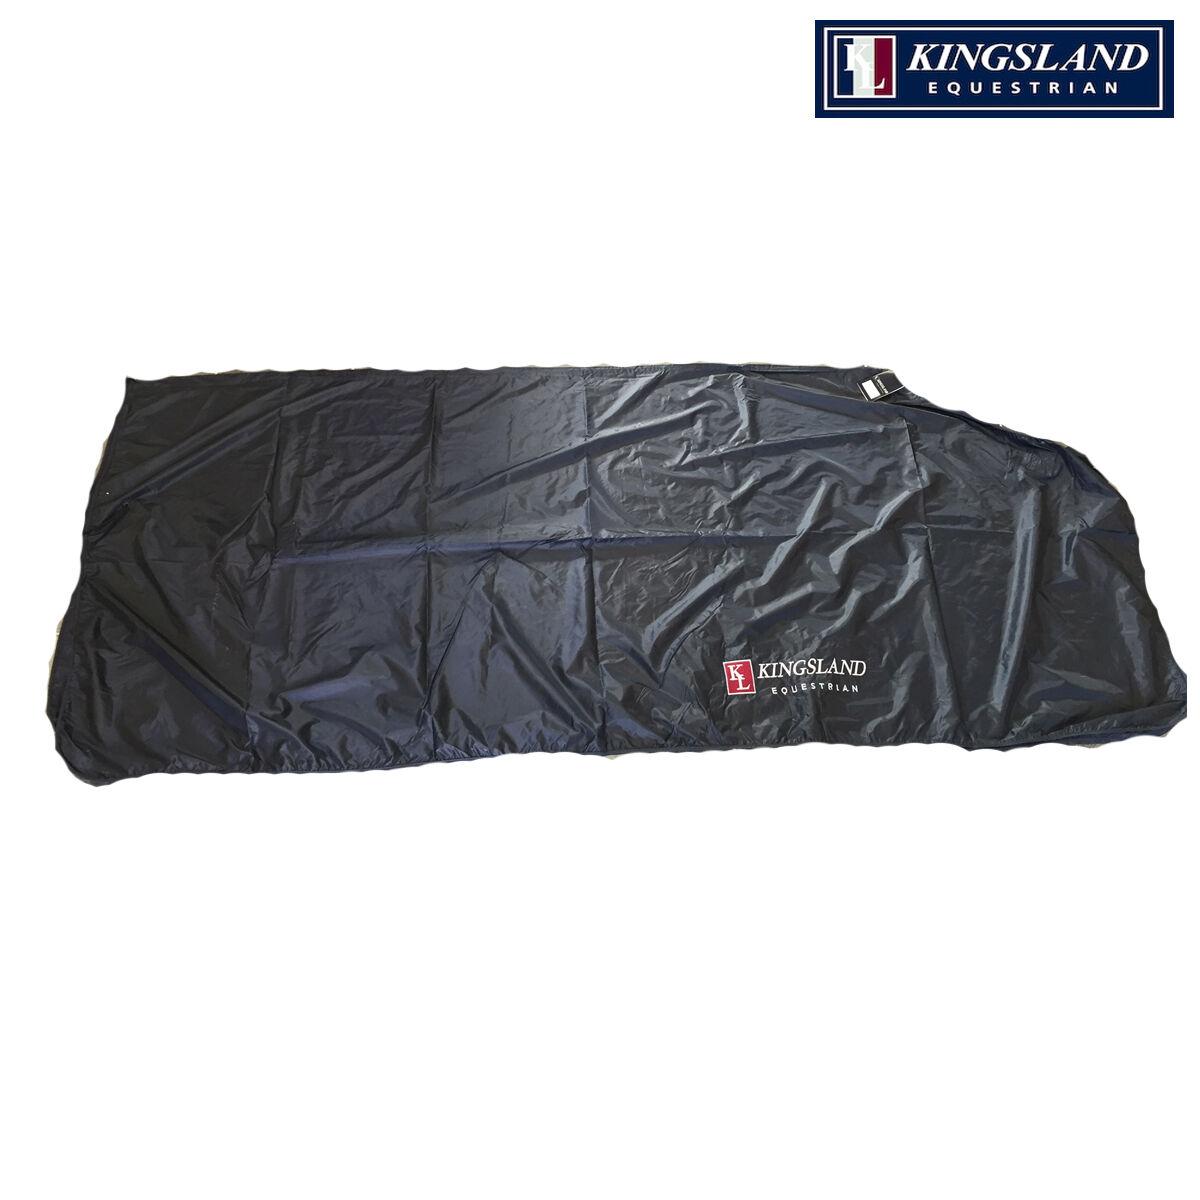 Kingsland Pioggia Foglio XL rb101 =  vendita vendita  outlet online